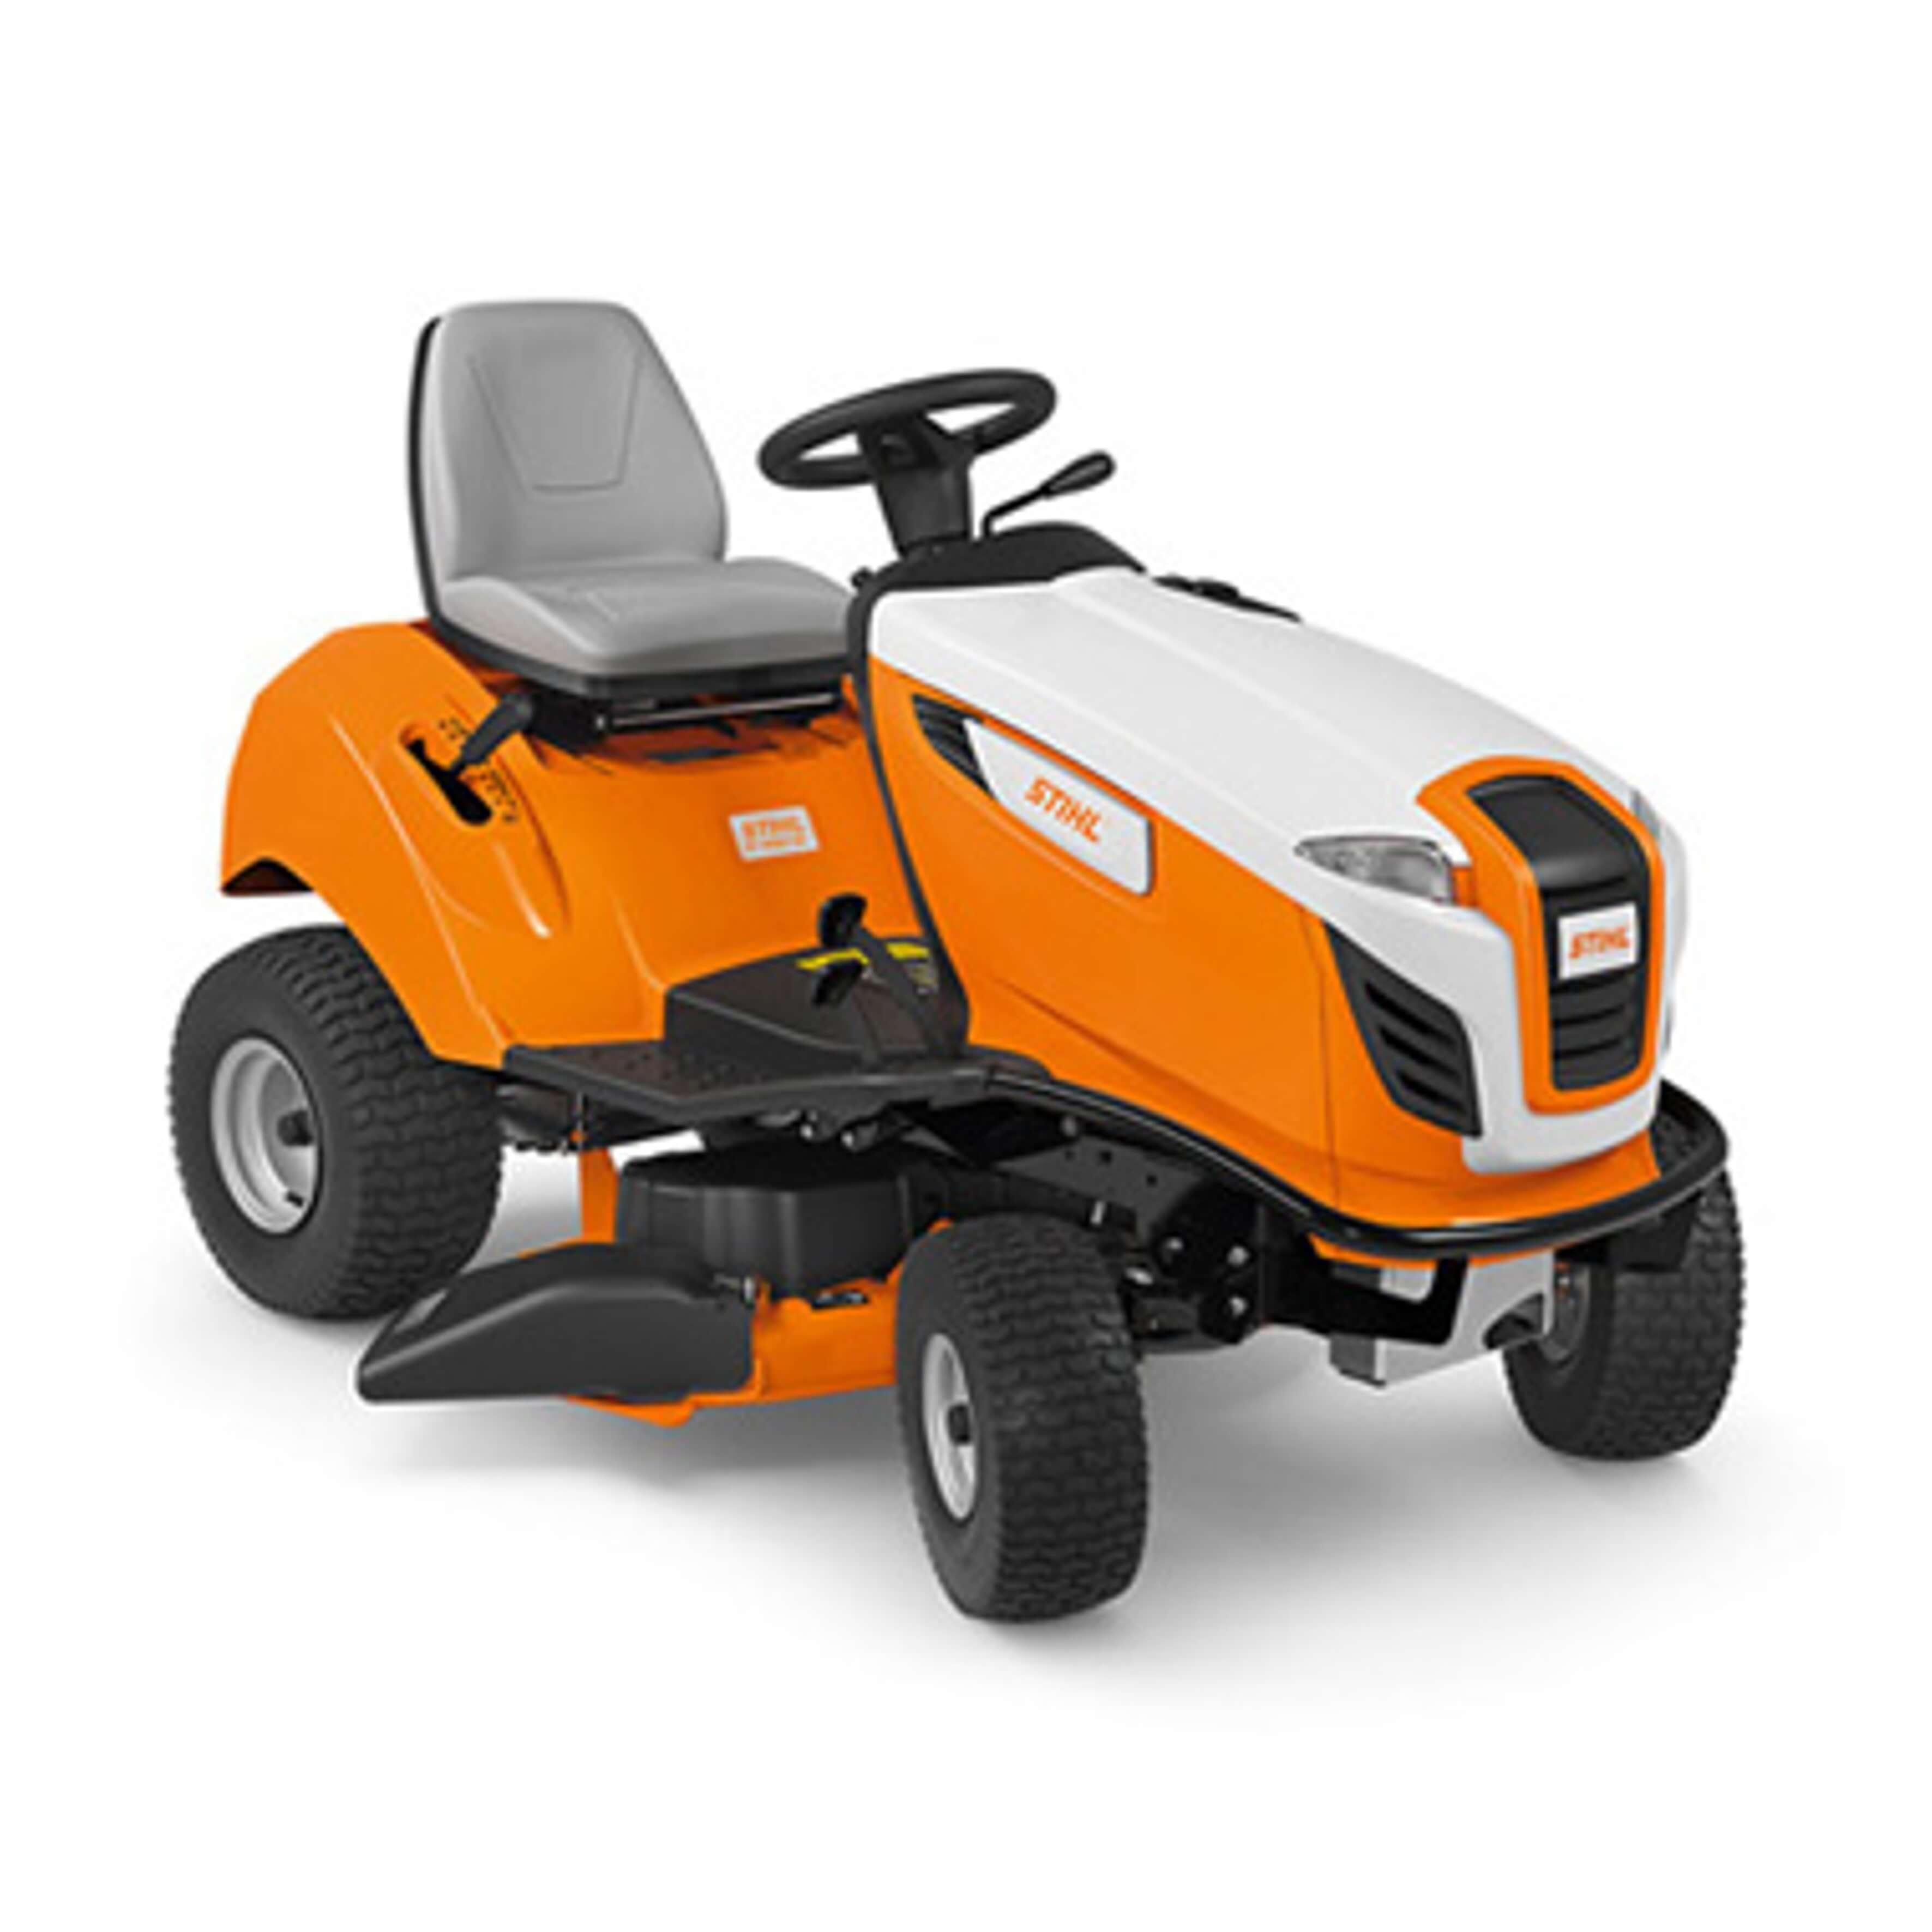 Stihl T4 Series Ride on Mower Parts